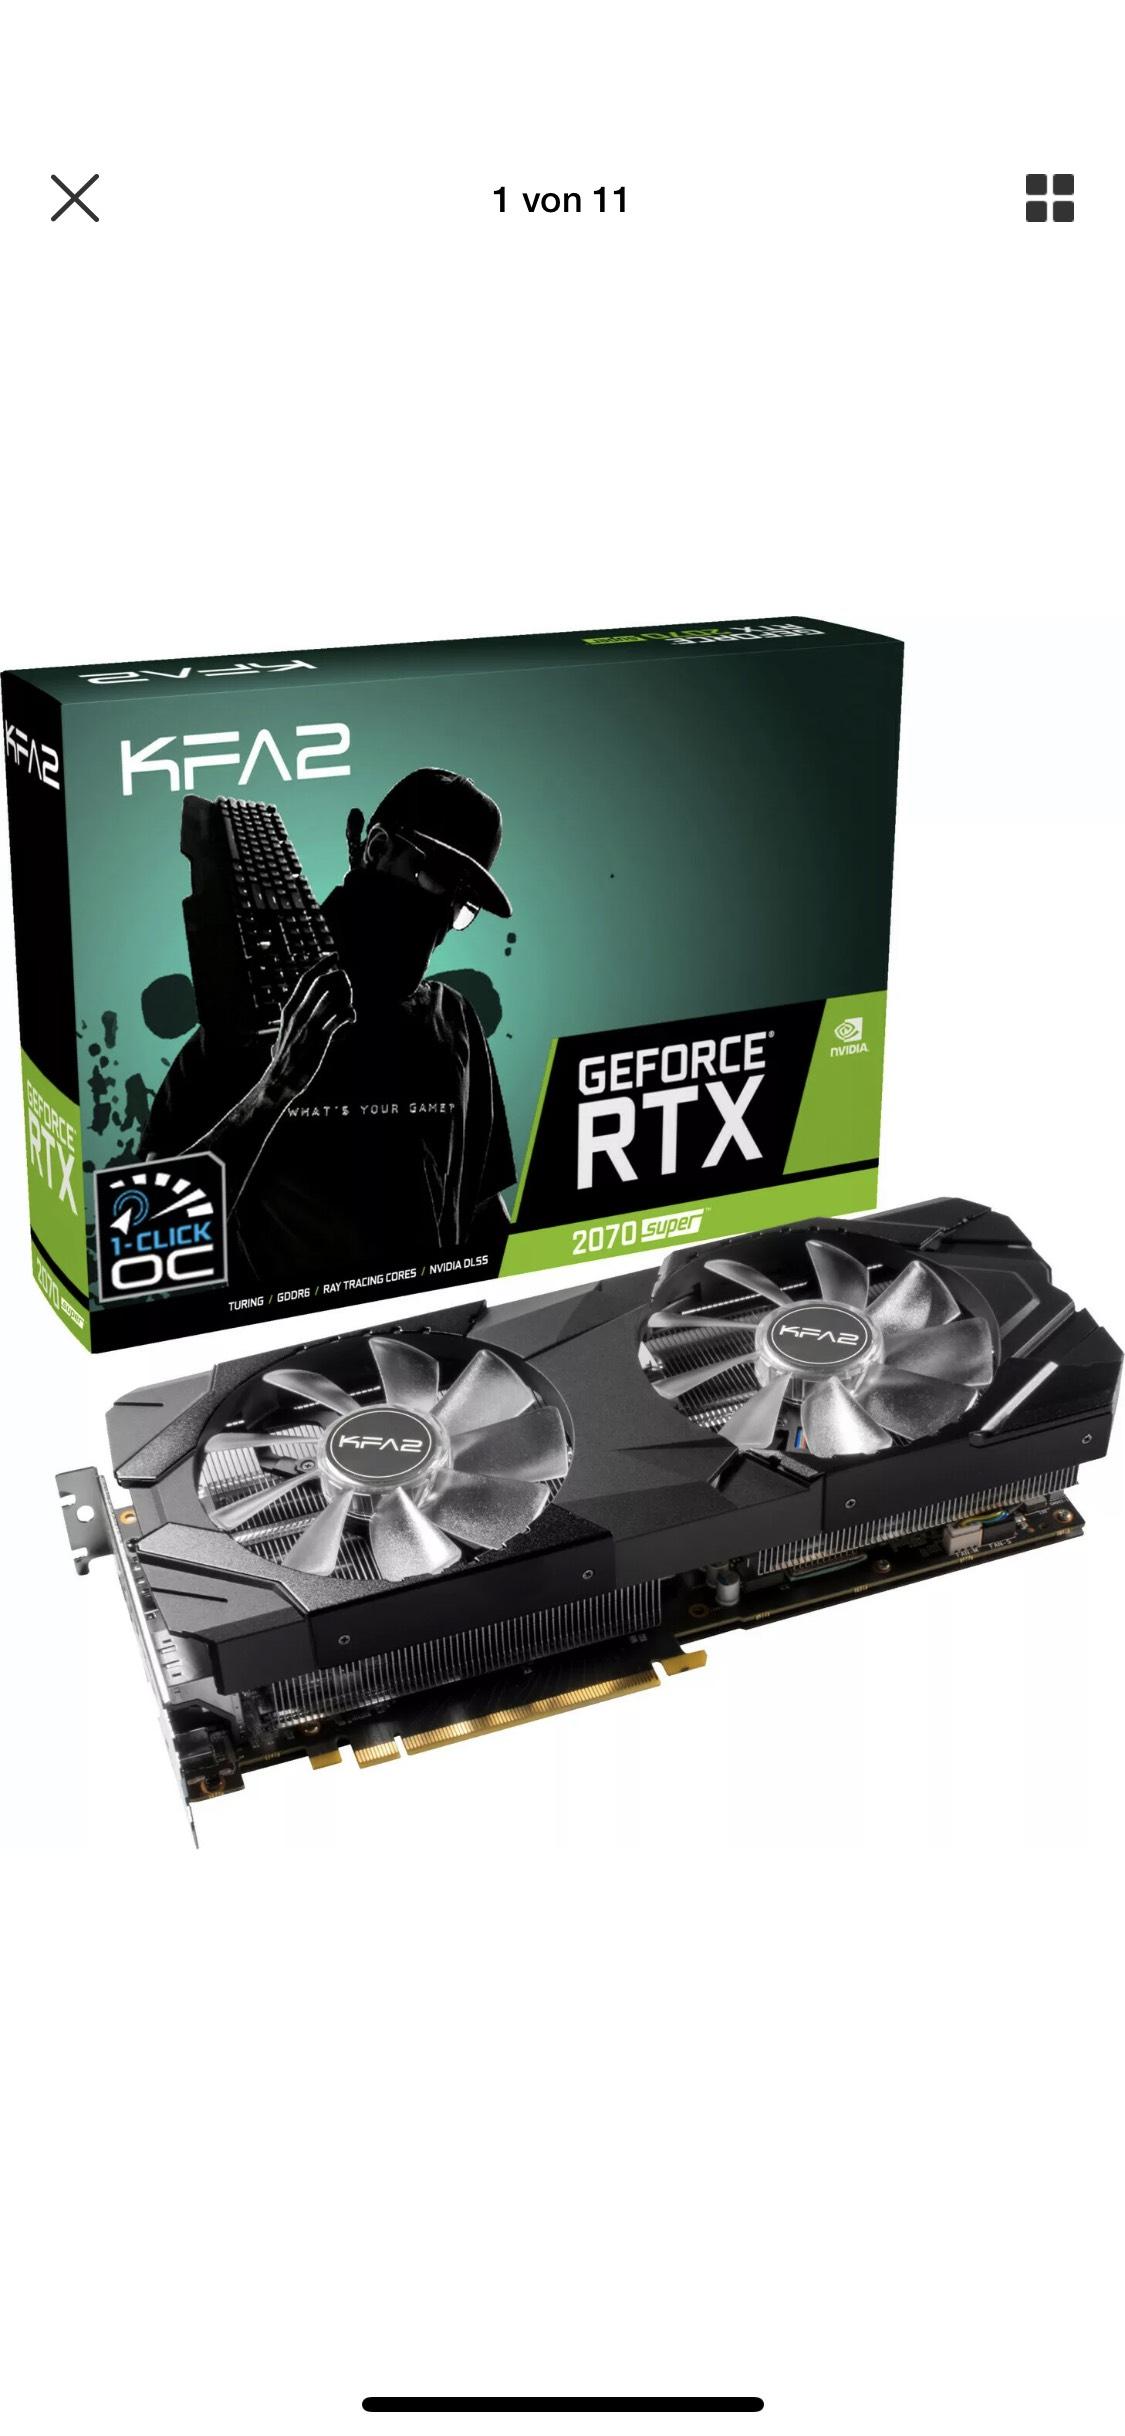 KFA2 GeForce® RTX 2070 SUPER™ EX 8GB (27ISL6MDU9EK) (NVIDIA, Grafikkarte)